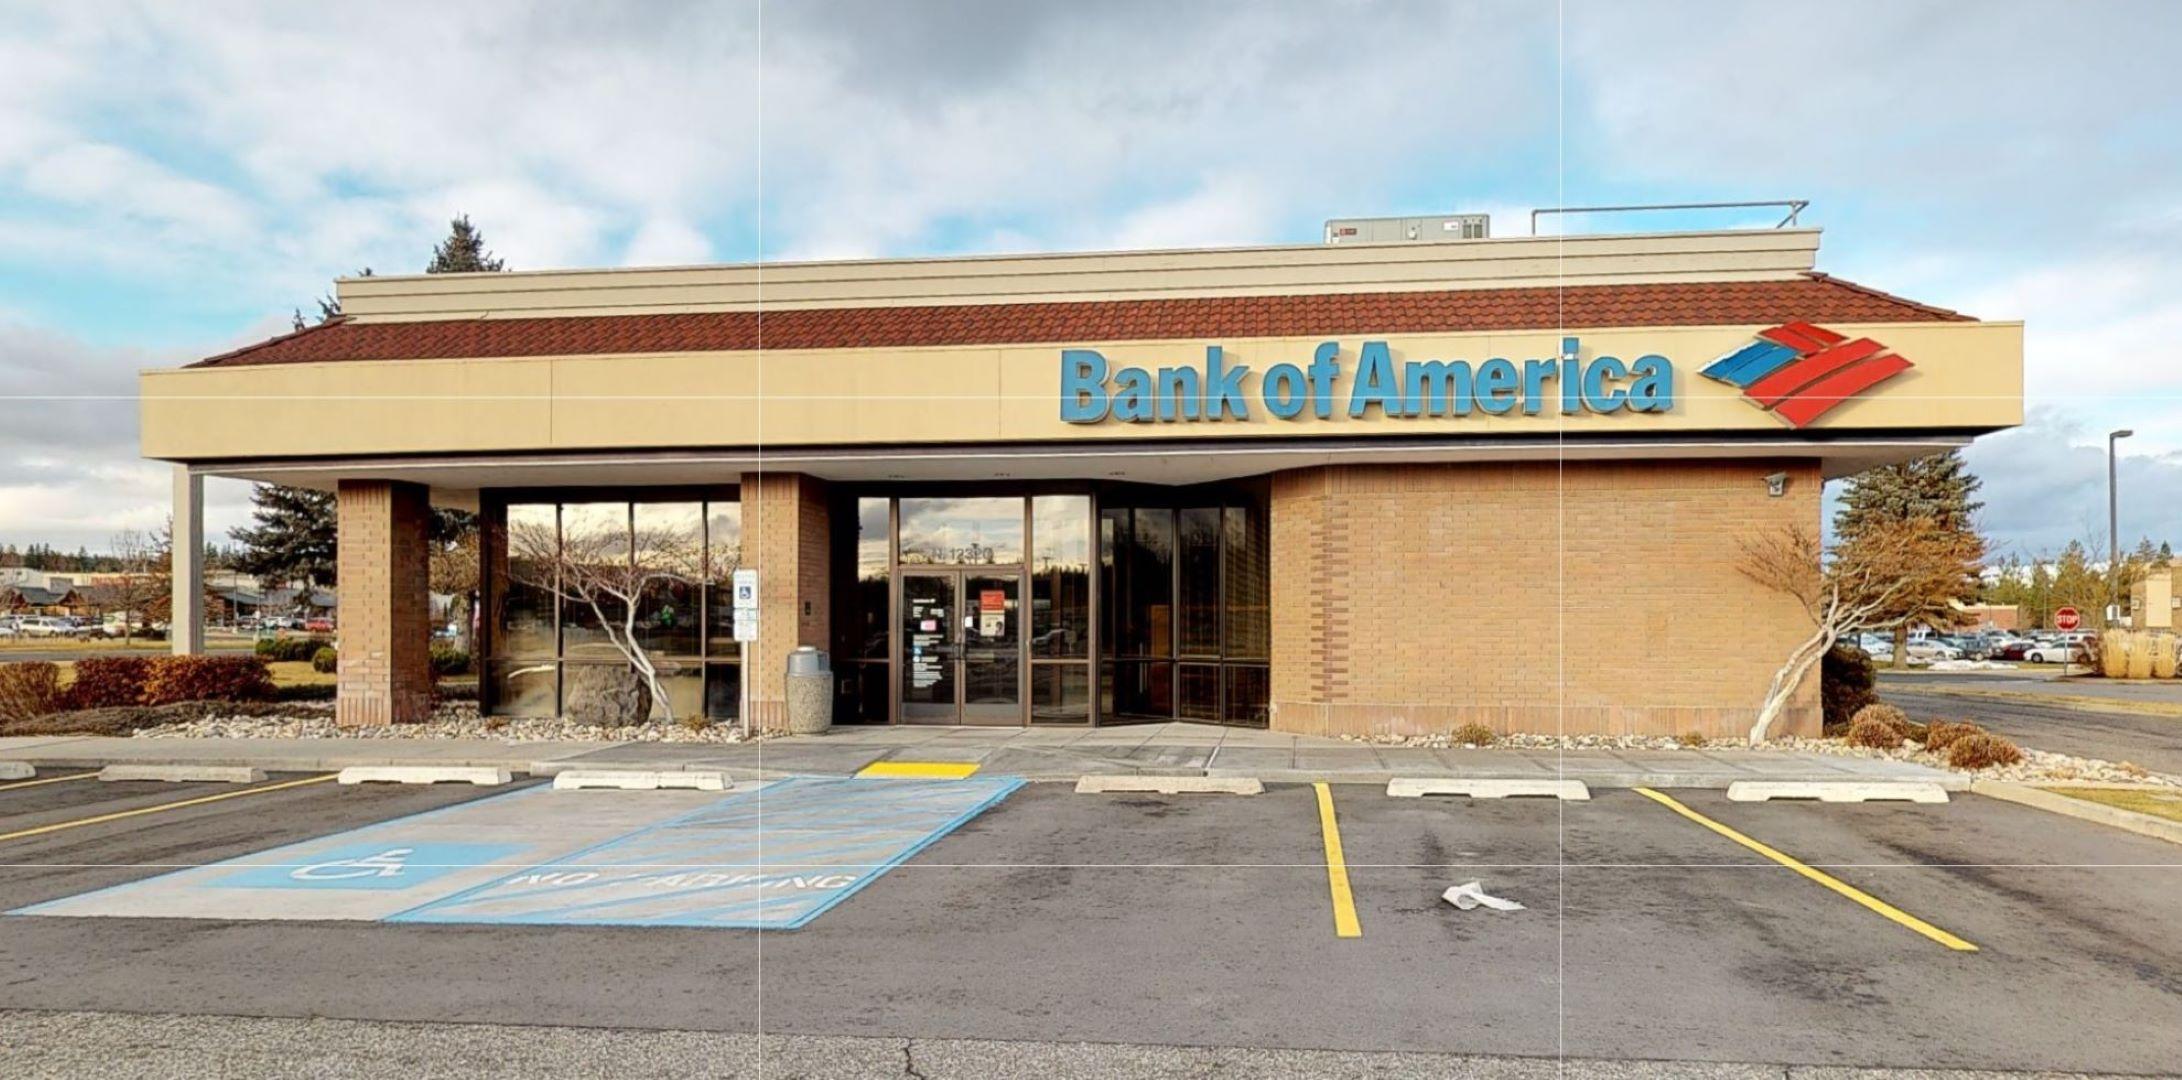 Bank of America financial center with drive-thru ATM   12320 Highway 395, Spokane, WA 99218